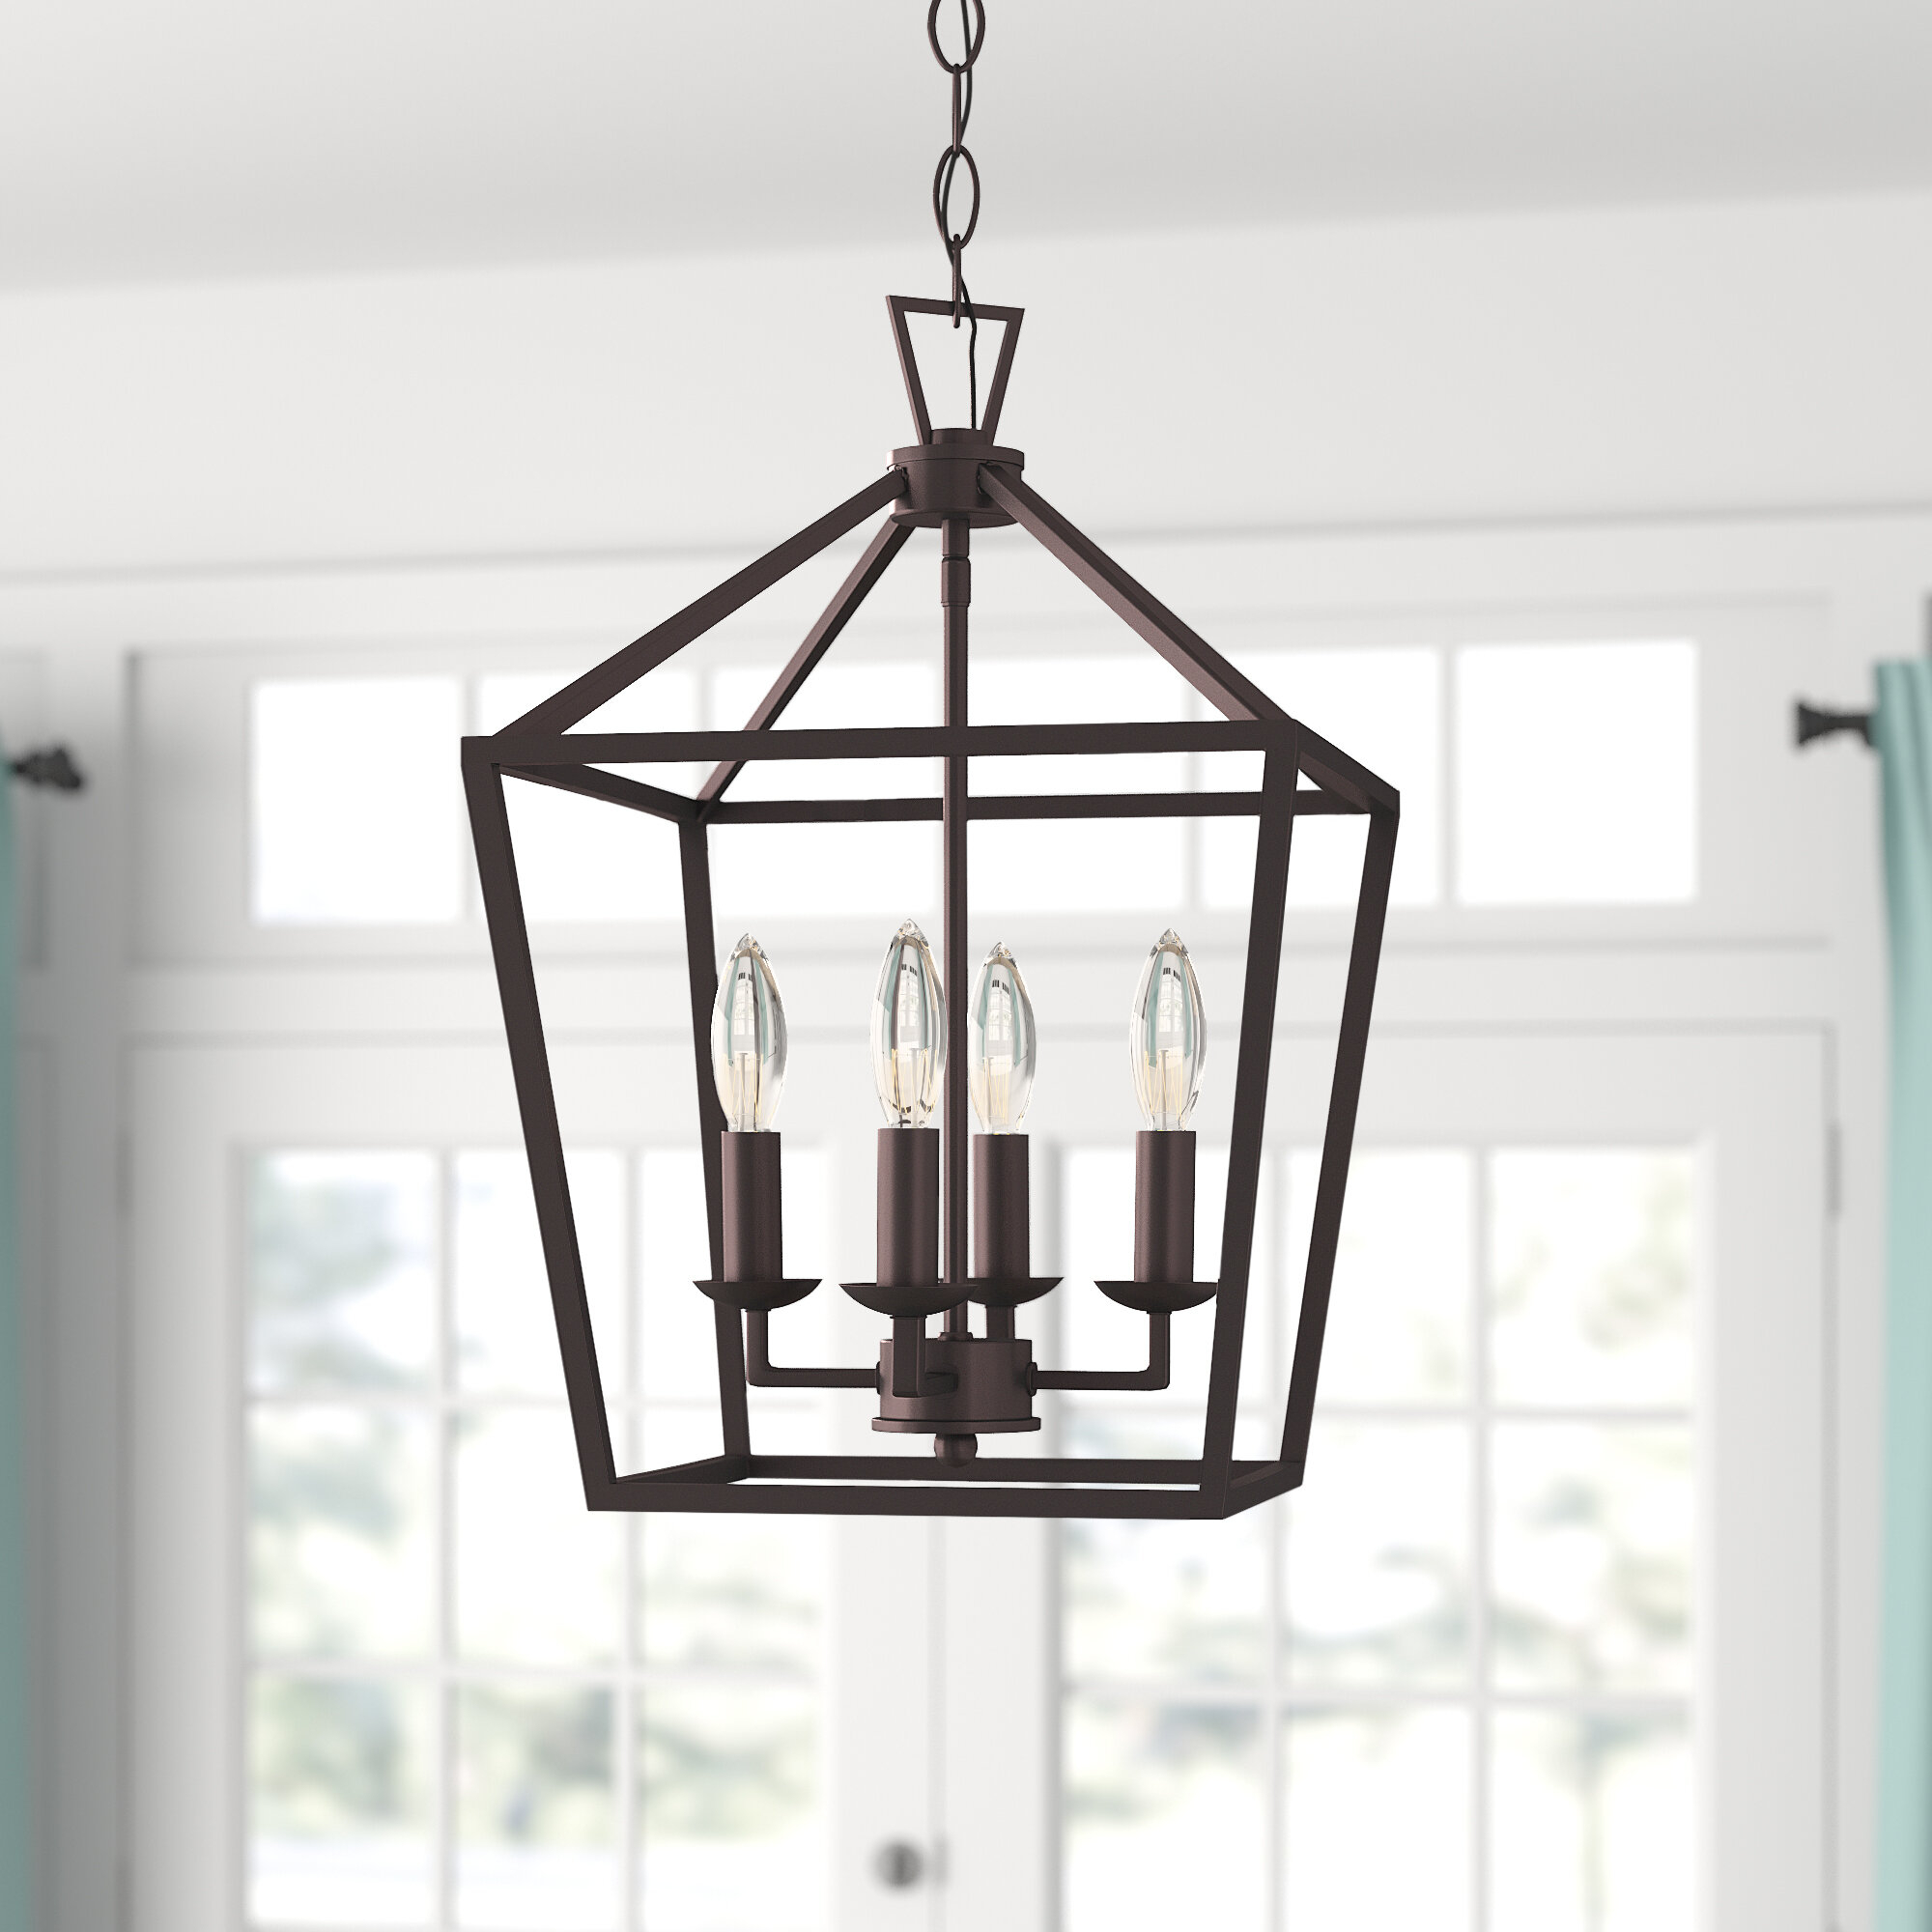 Carmen 4 Light Lantern Geometric Pendant & Reviews | Joss & Main With Delon 1 Light Lantern Geometric Pendants (View 12 of 30)